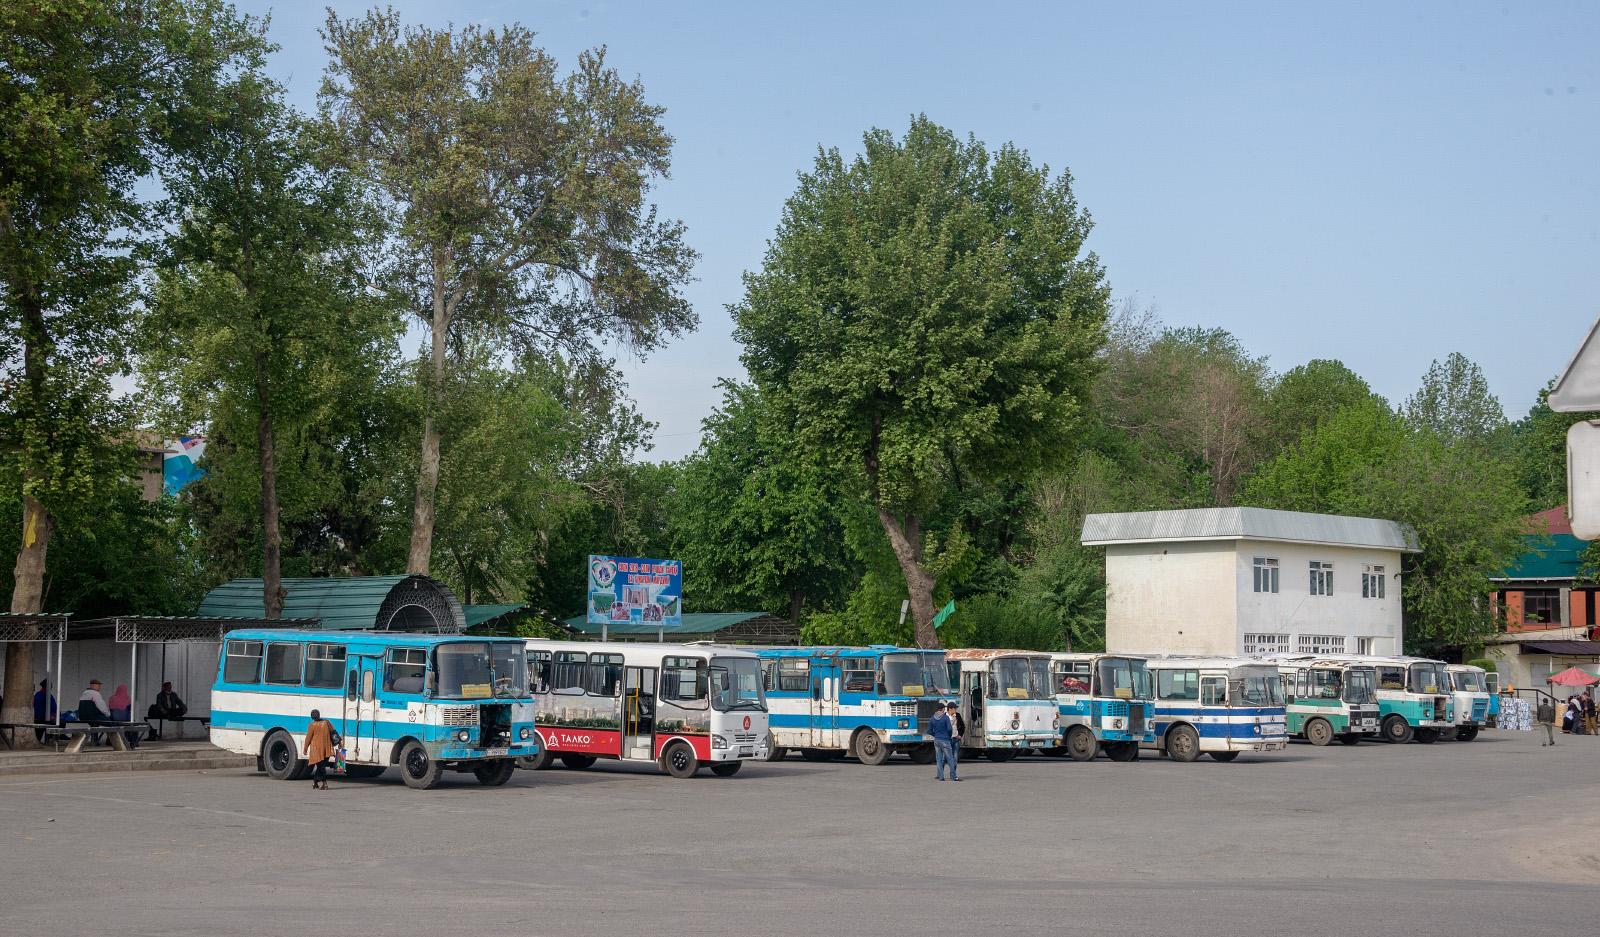 Таджикистан-3205, ЛАЗ-695Н, Кубань-Г1А1. Таджикістан, Турсунзаде